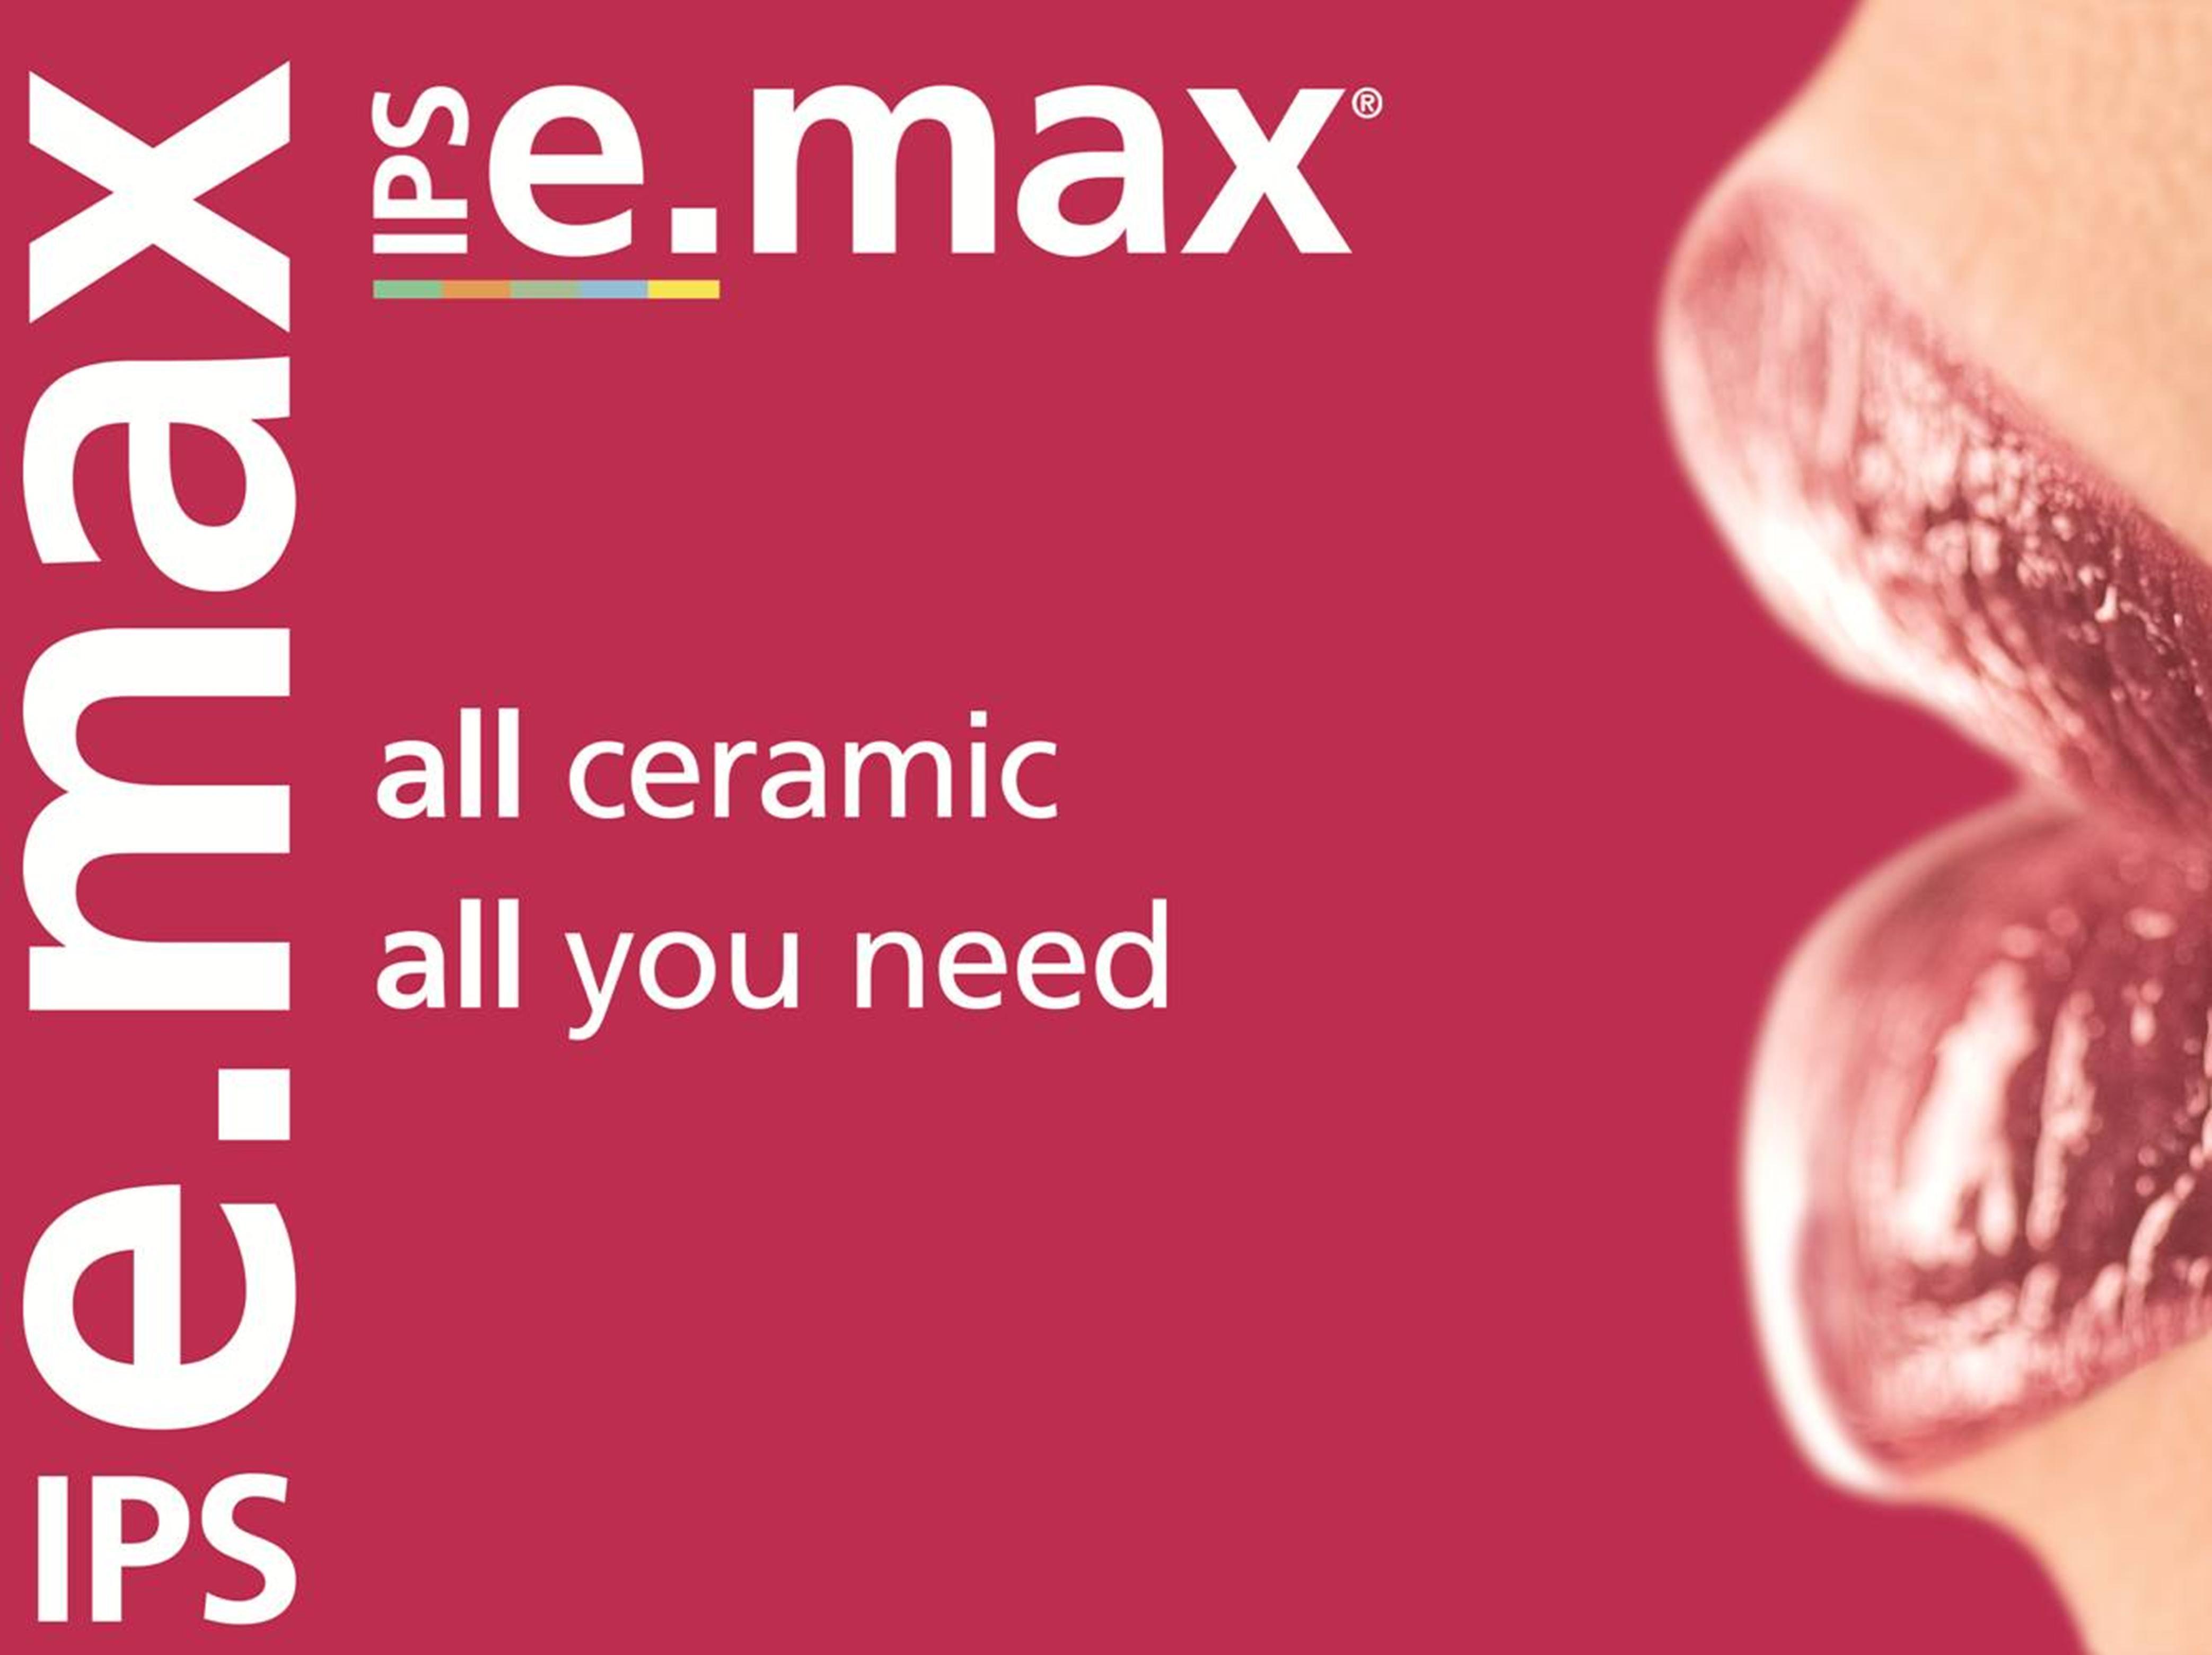 ivoclar-e.max-logo.jpg